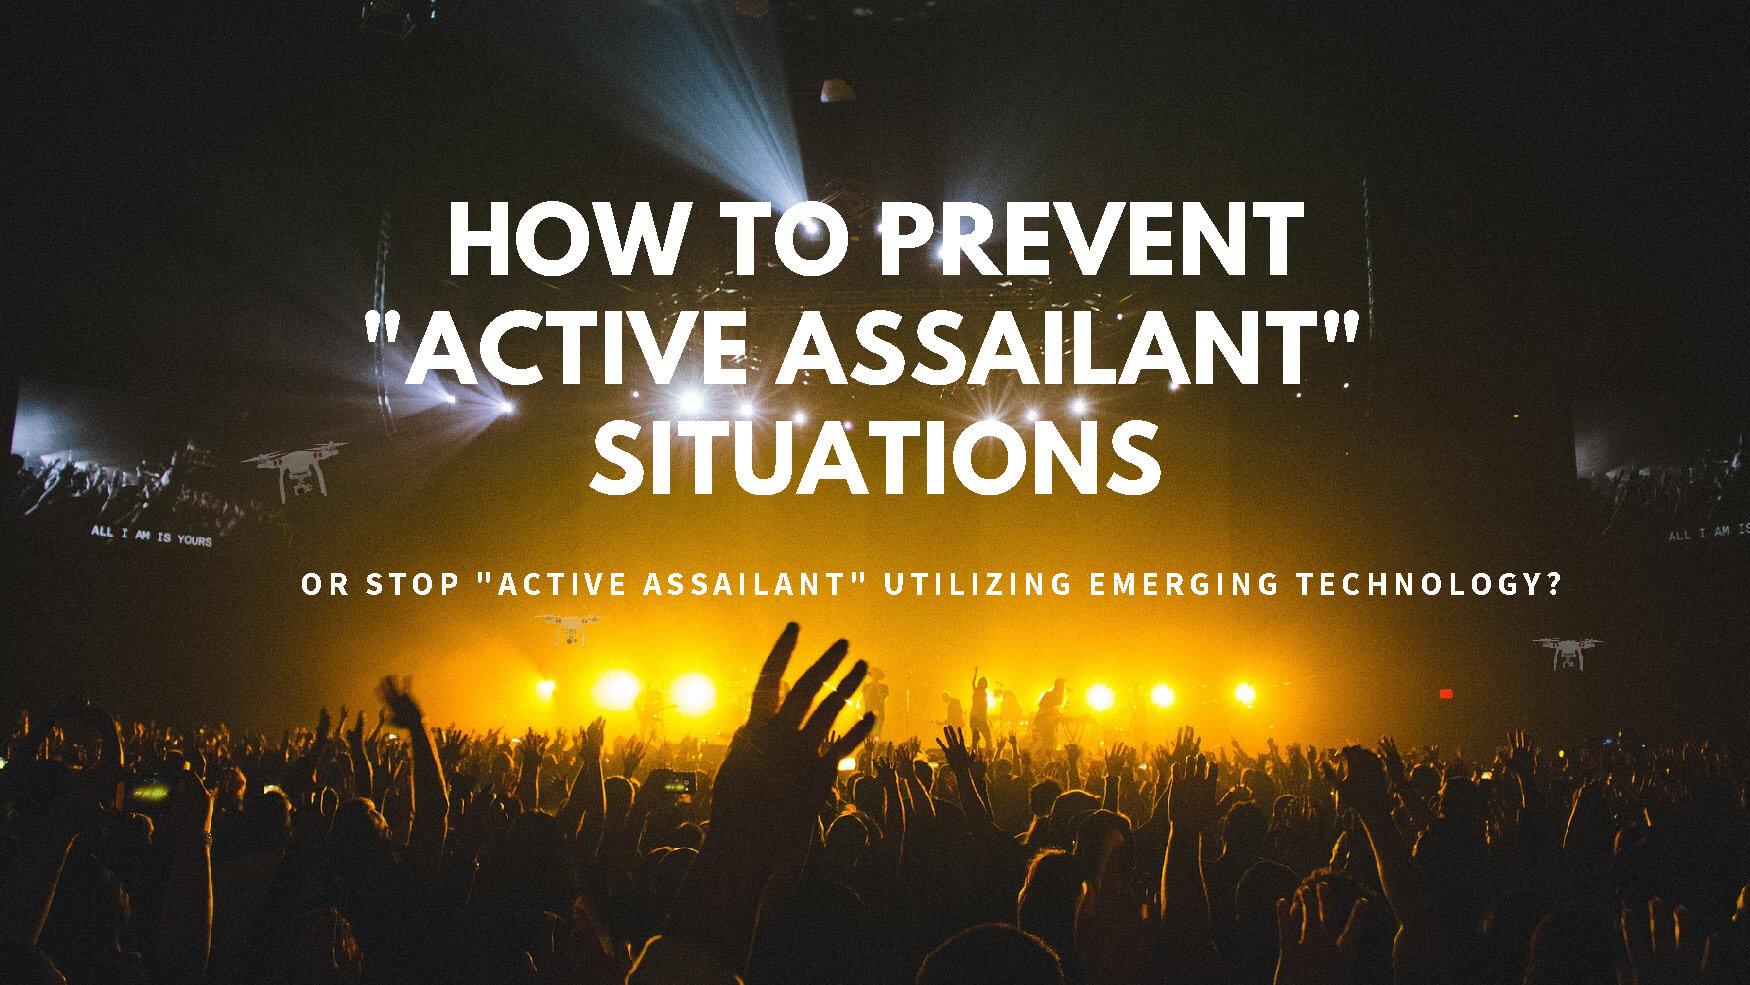 Prevent Active Assailant Situations